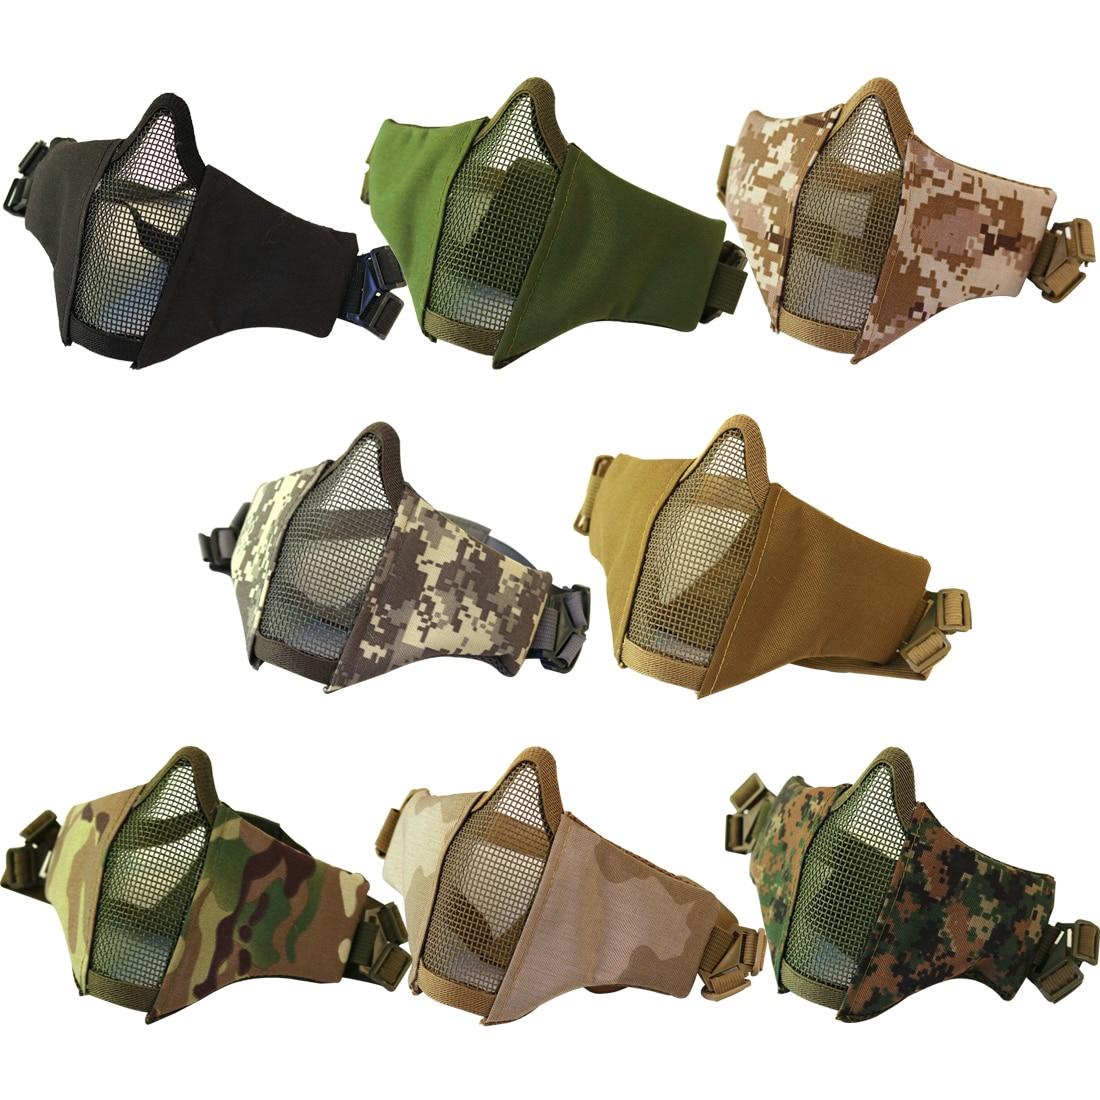 Popular Airsoft Mask-Buy Cheap Airsoft Mask lots from China ...